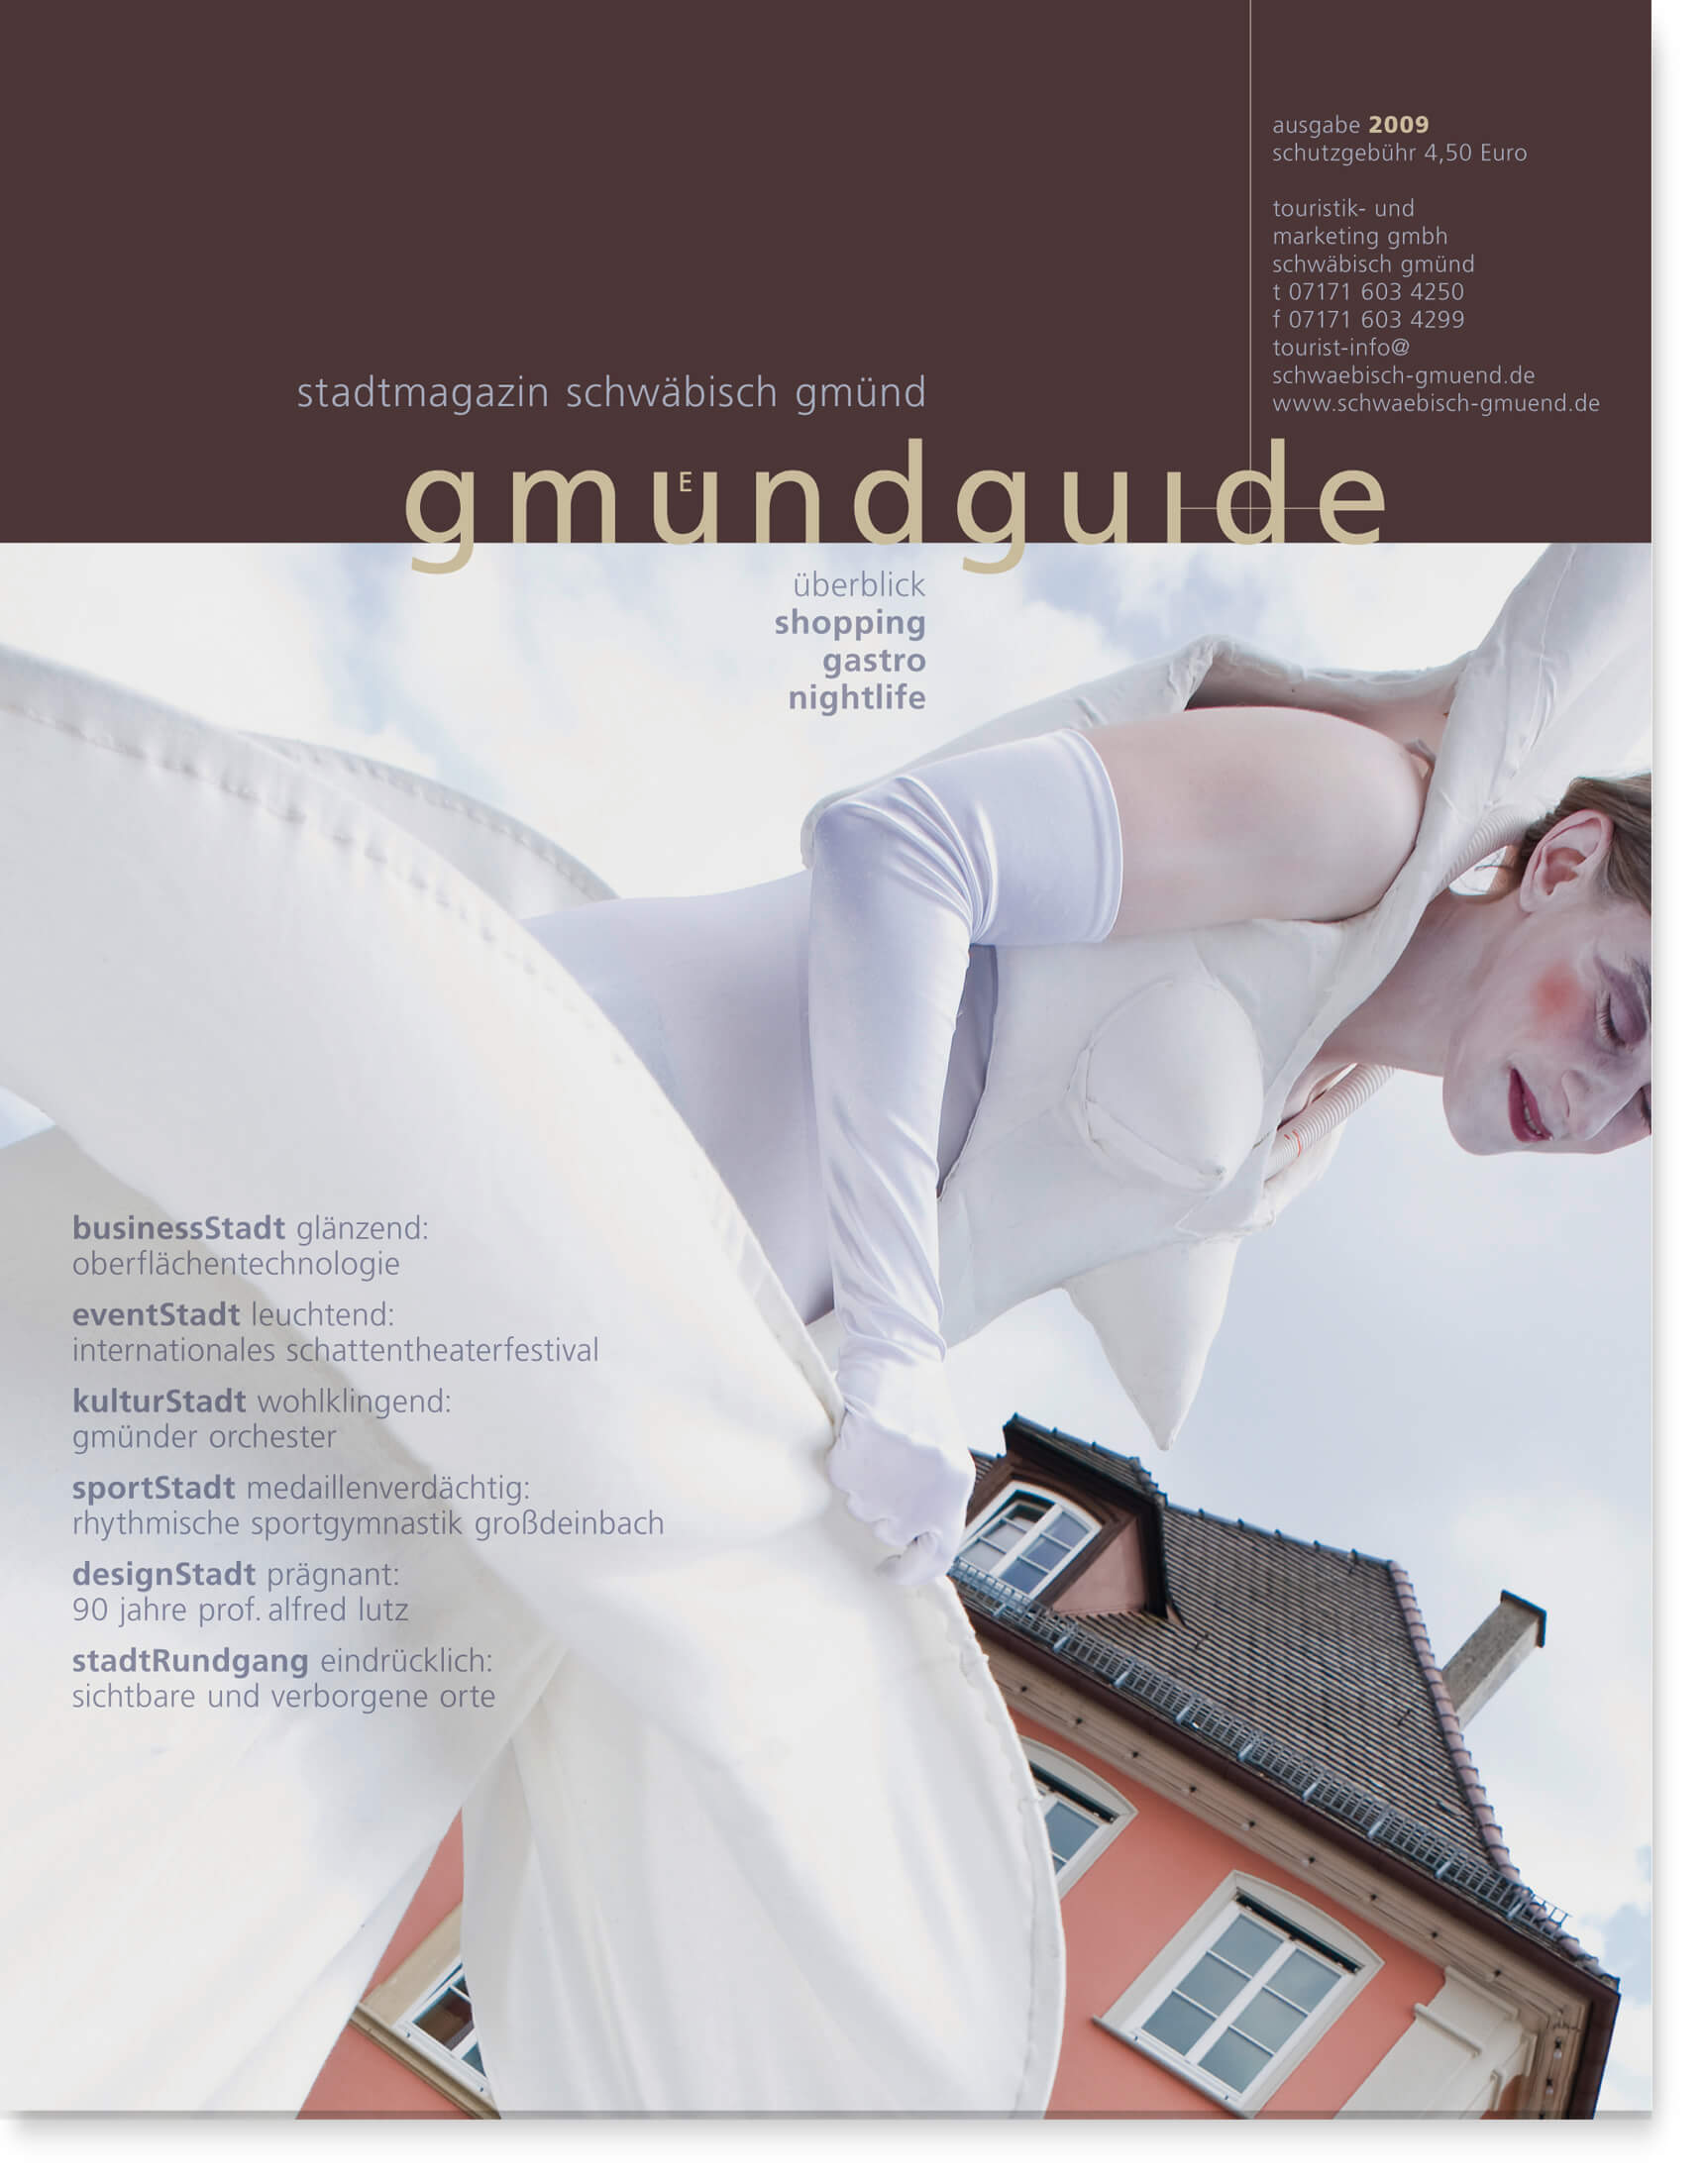 fh-web-gmuendguide-2009-1.jpg